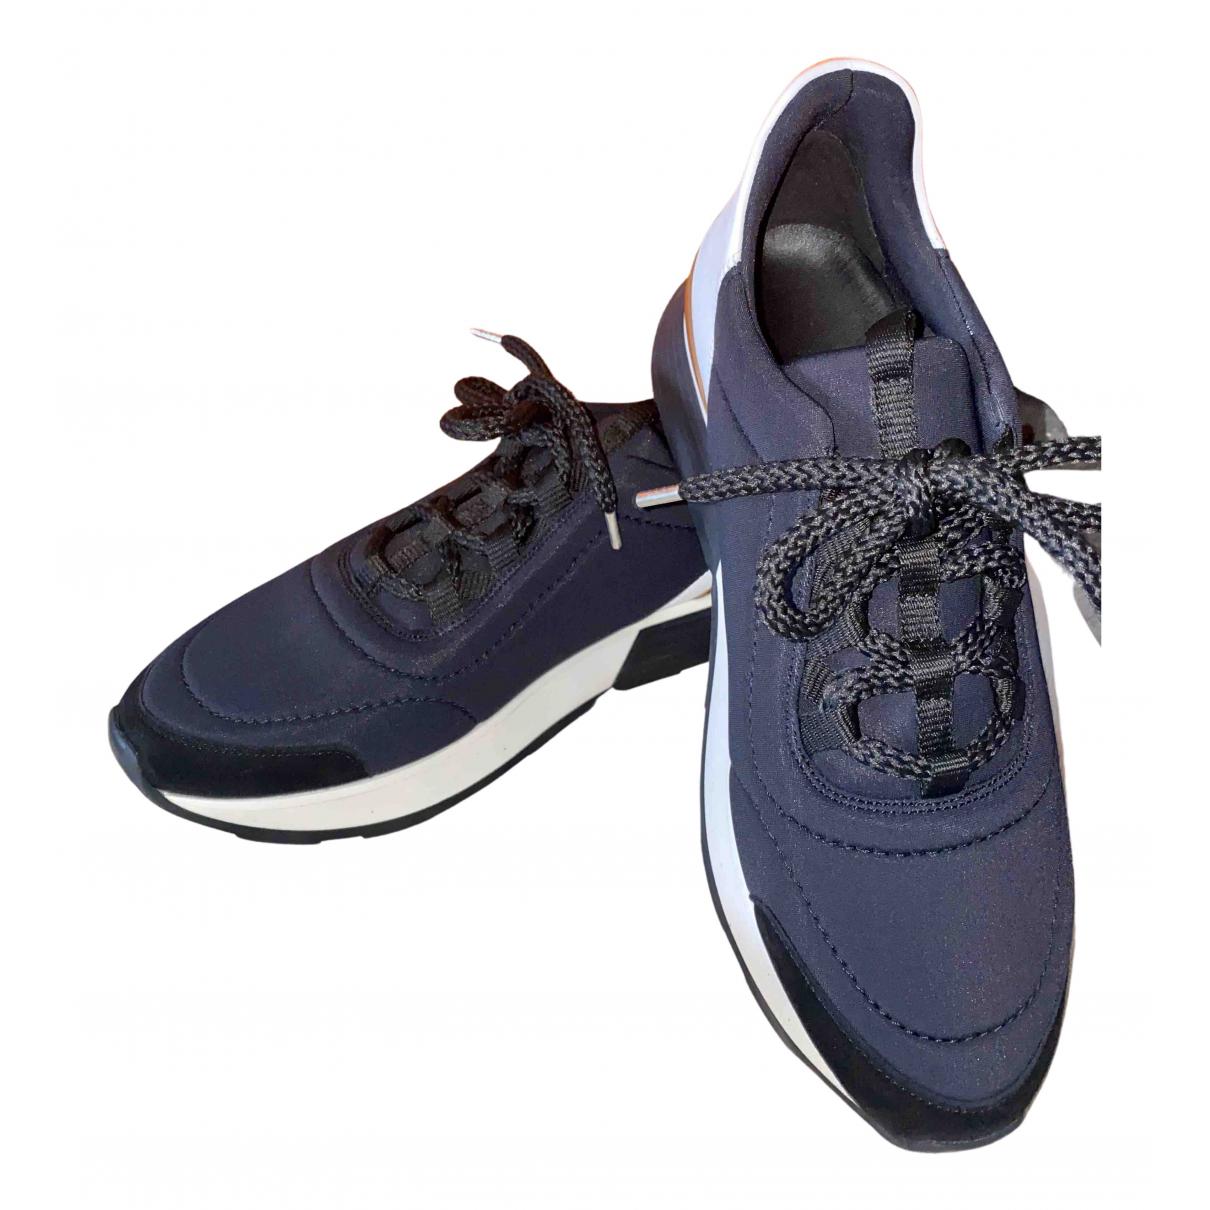 Hermès N Blue Cloth Trainers for Women 38 EU